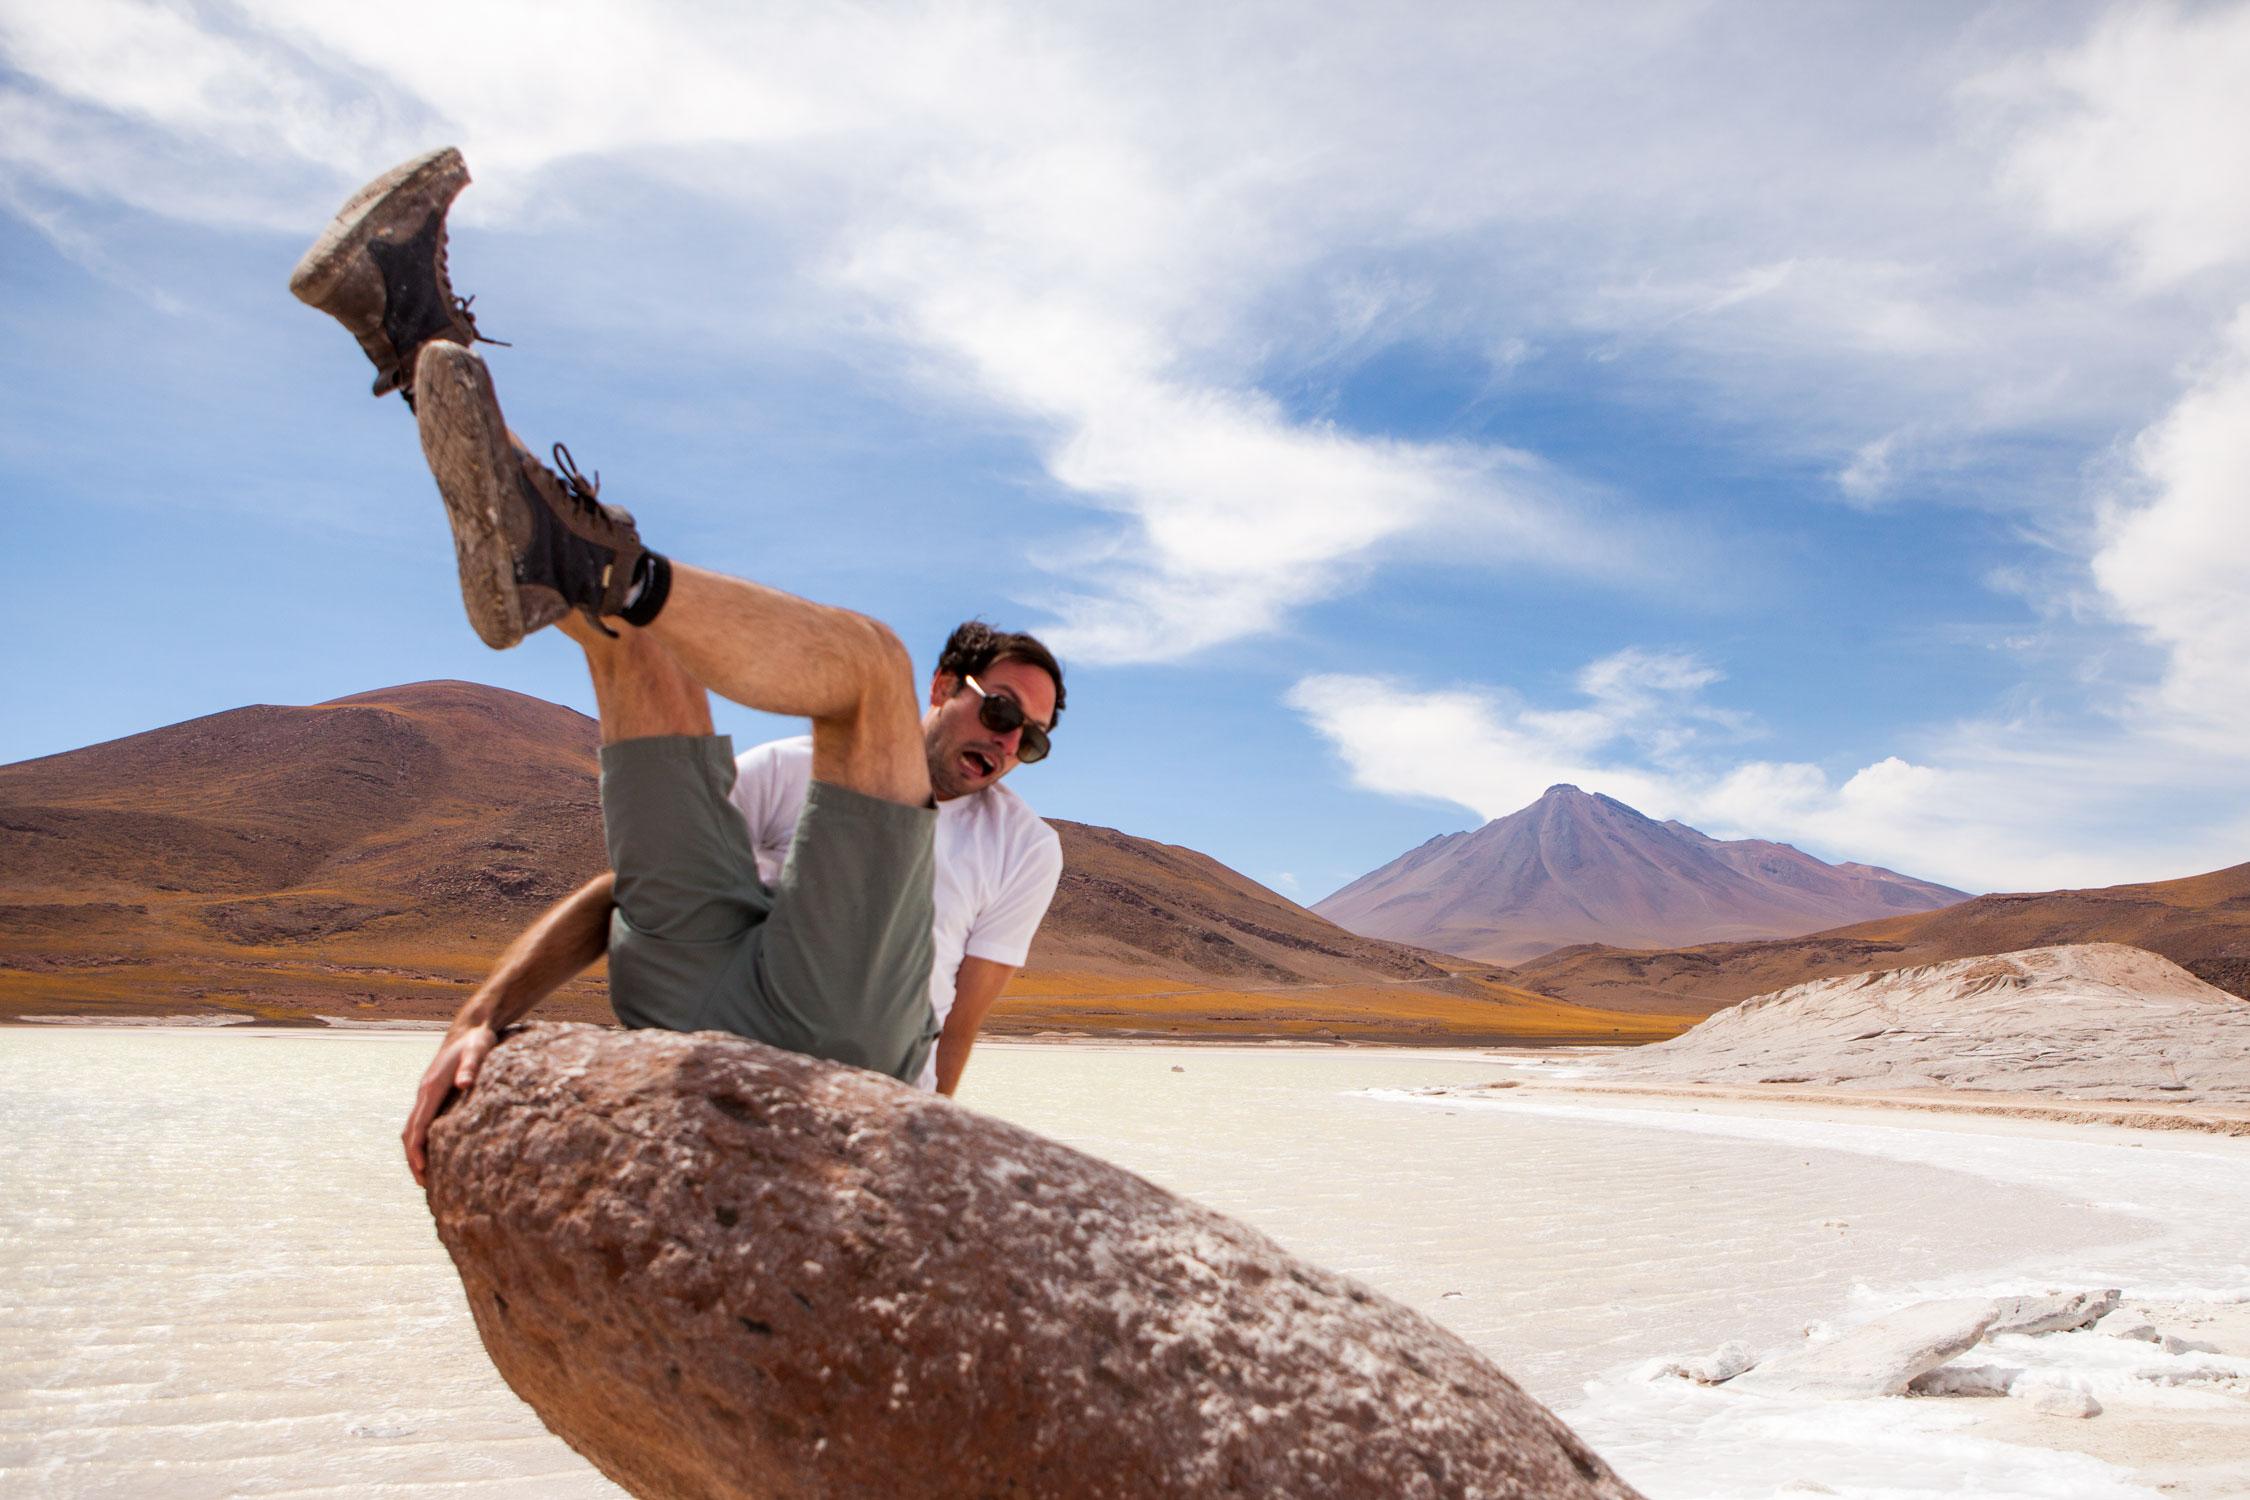 atacama-desert-chile-wander-south-piedras-rojas-Tyler-1.jpg